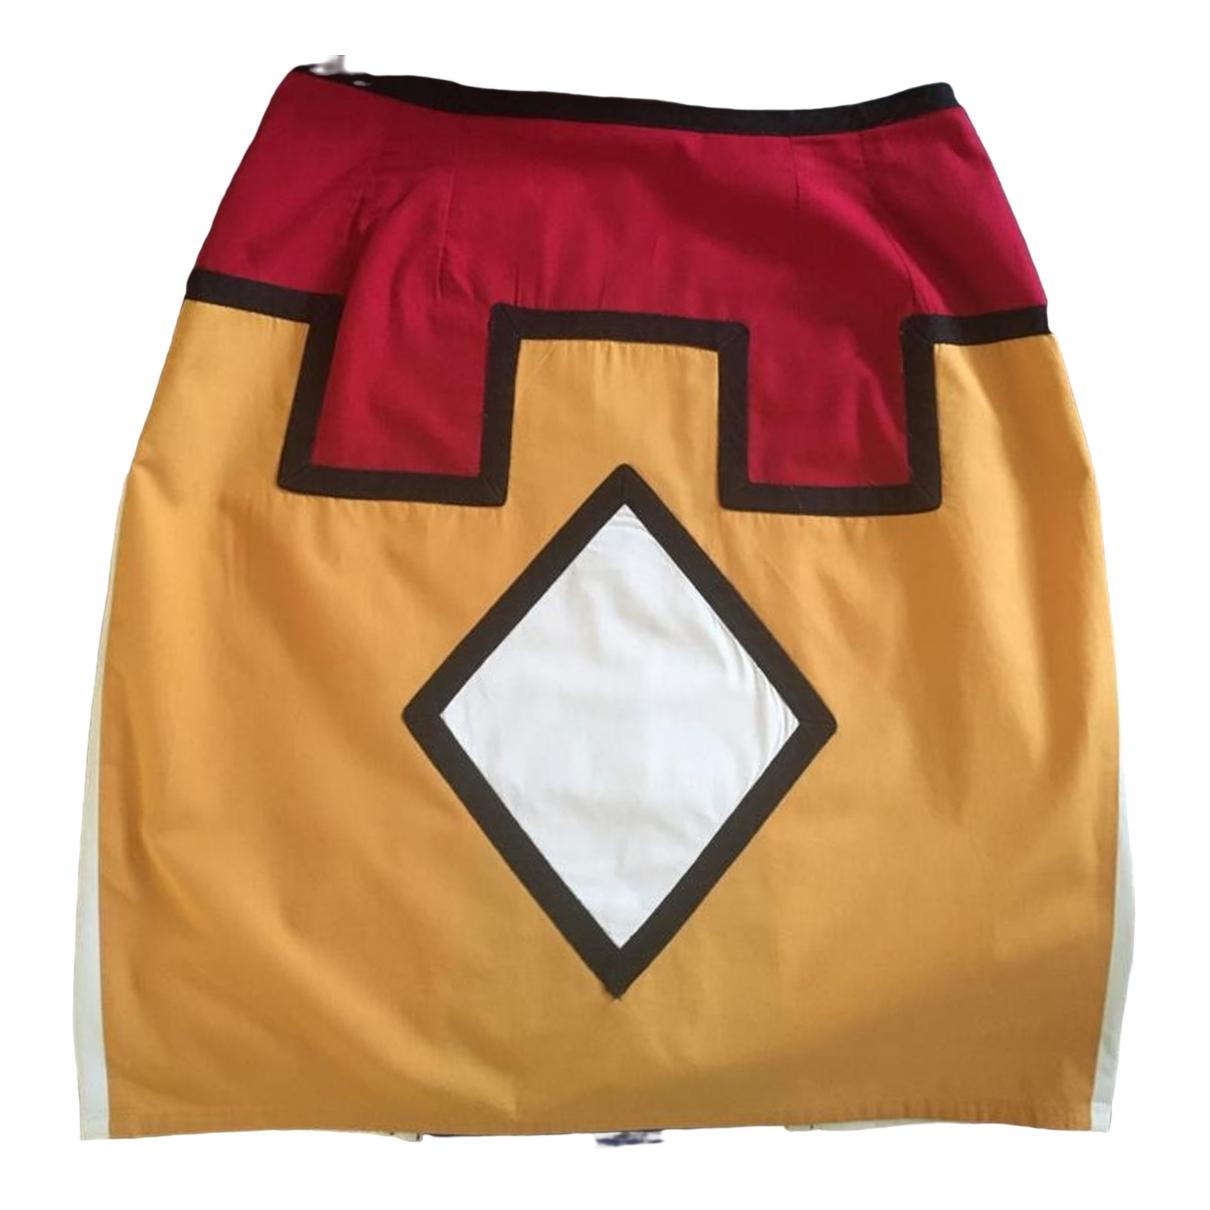 Chantal Thomass \N Cotton skirt for Women S International